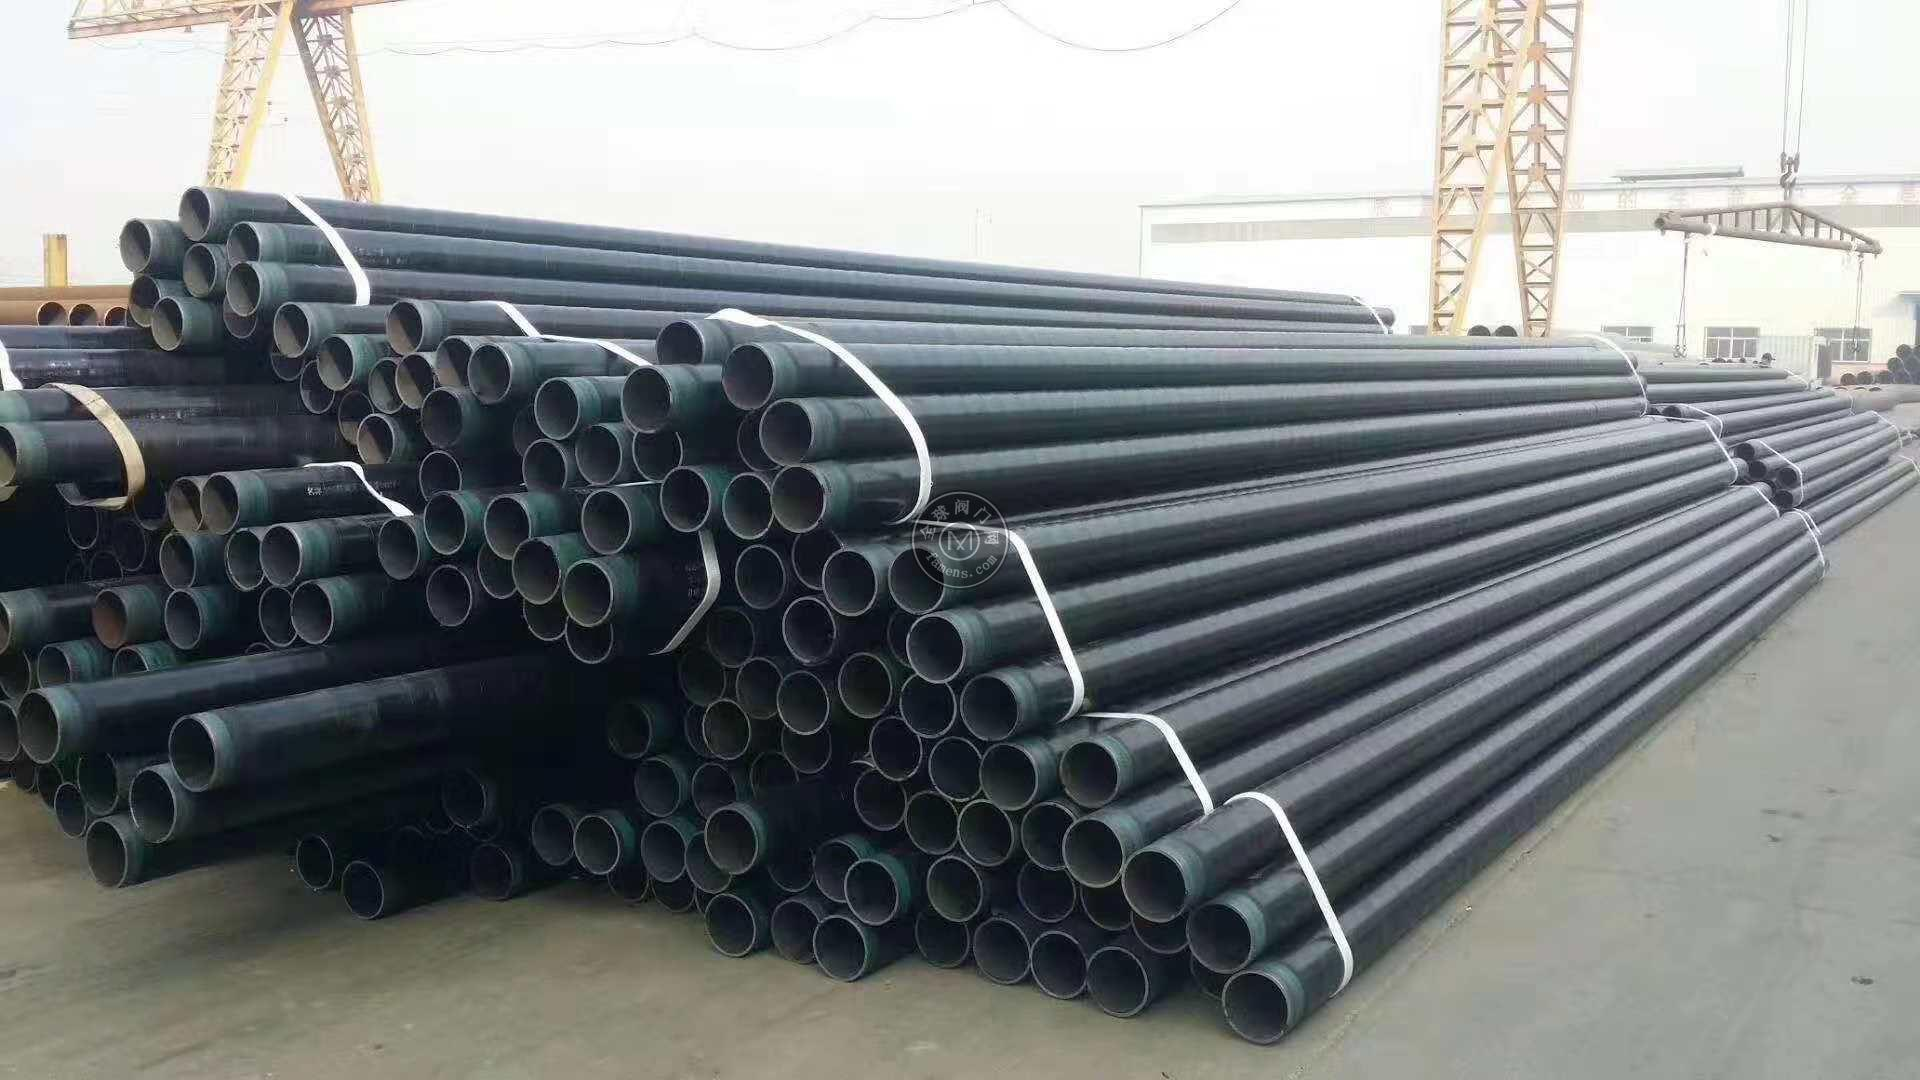 3pe防腐螺旋管 3pe防腐钢管 沧州市管都管道有限公司